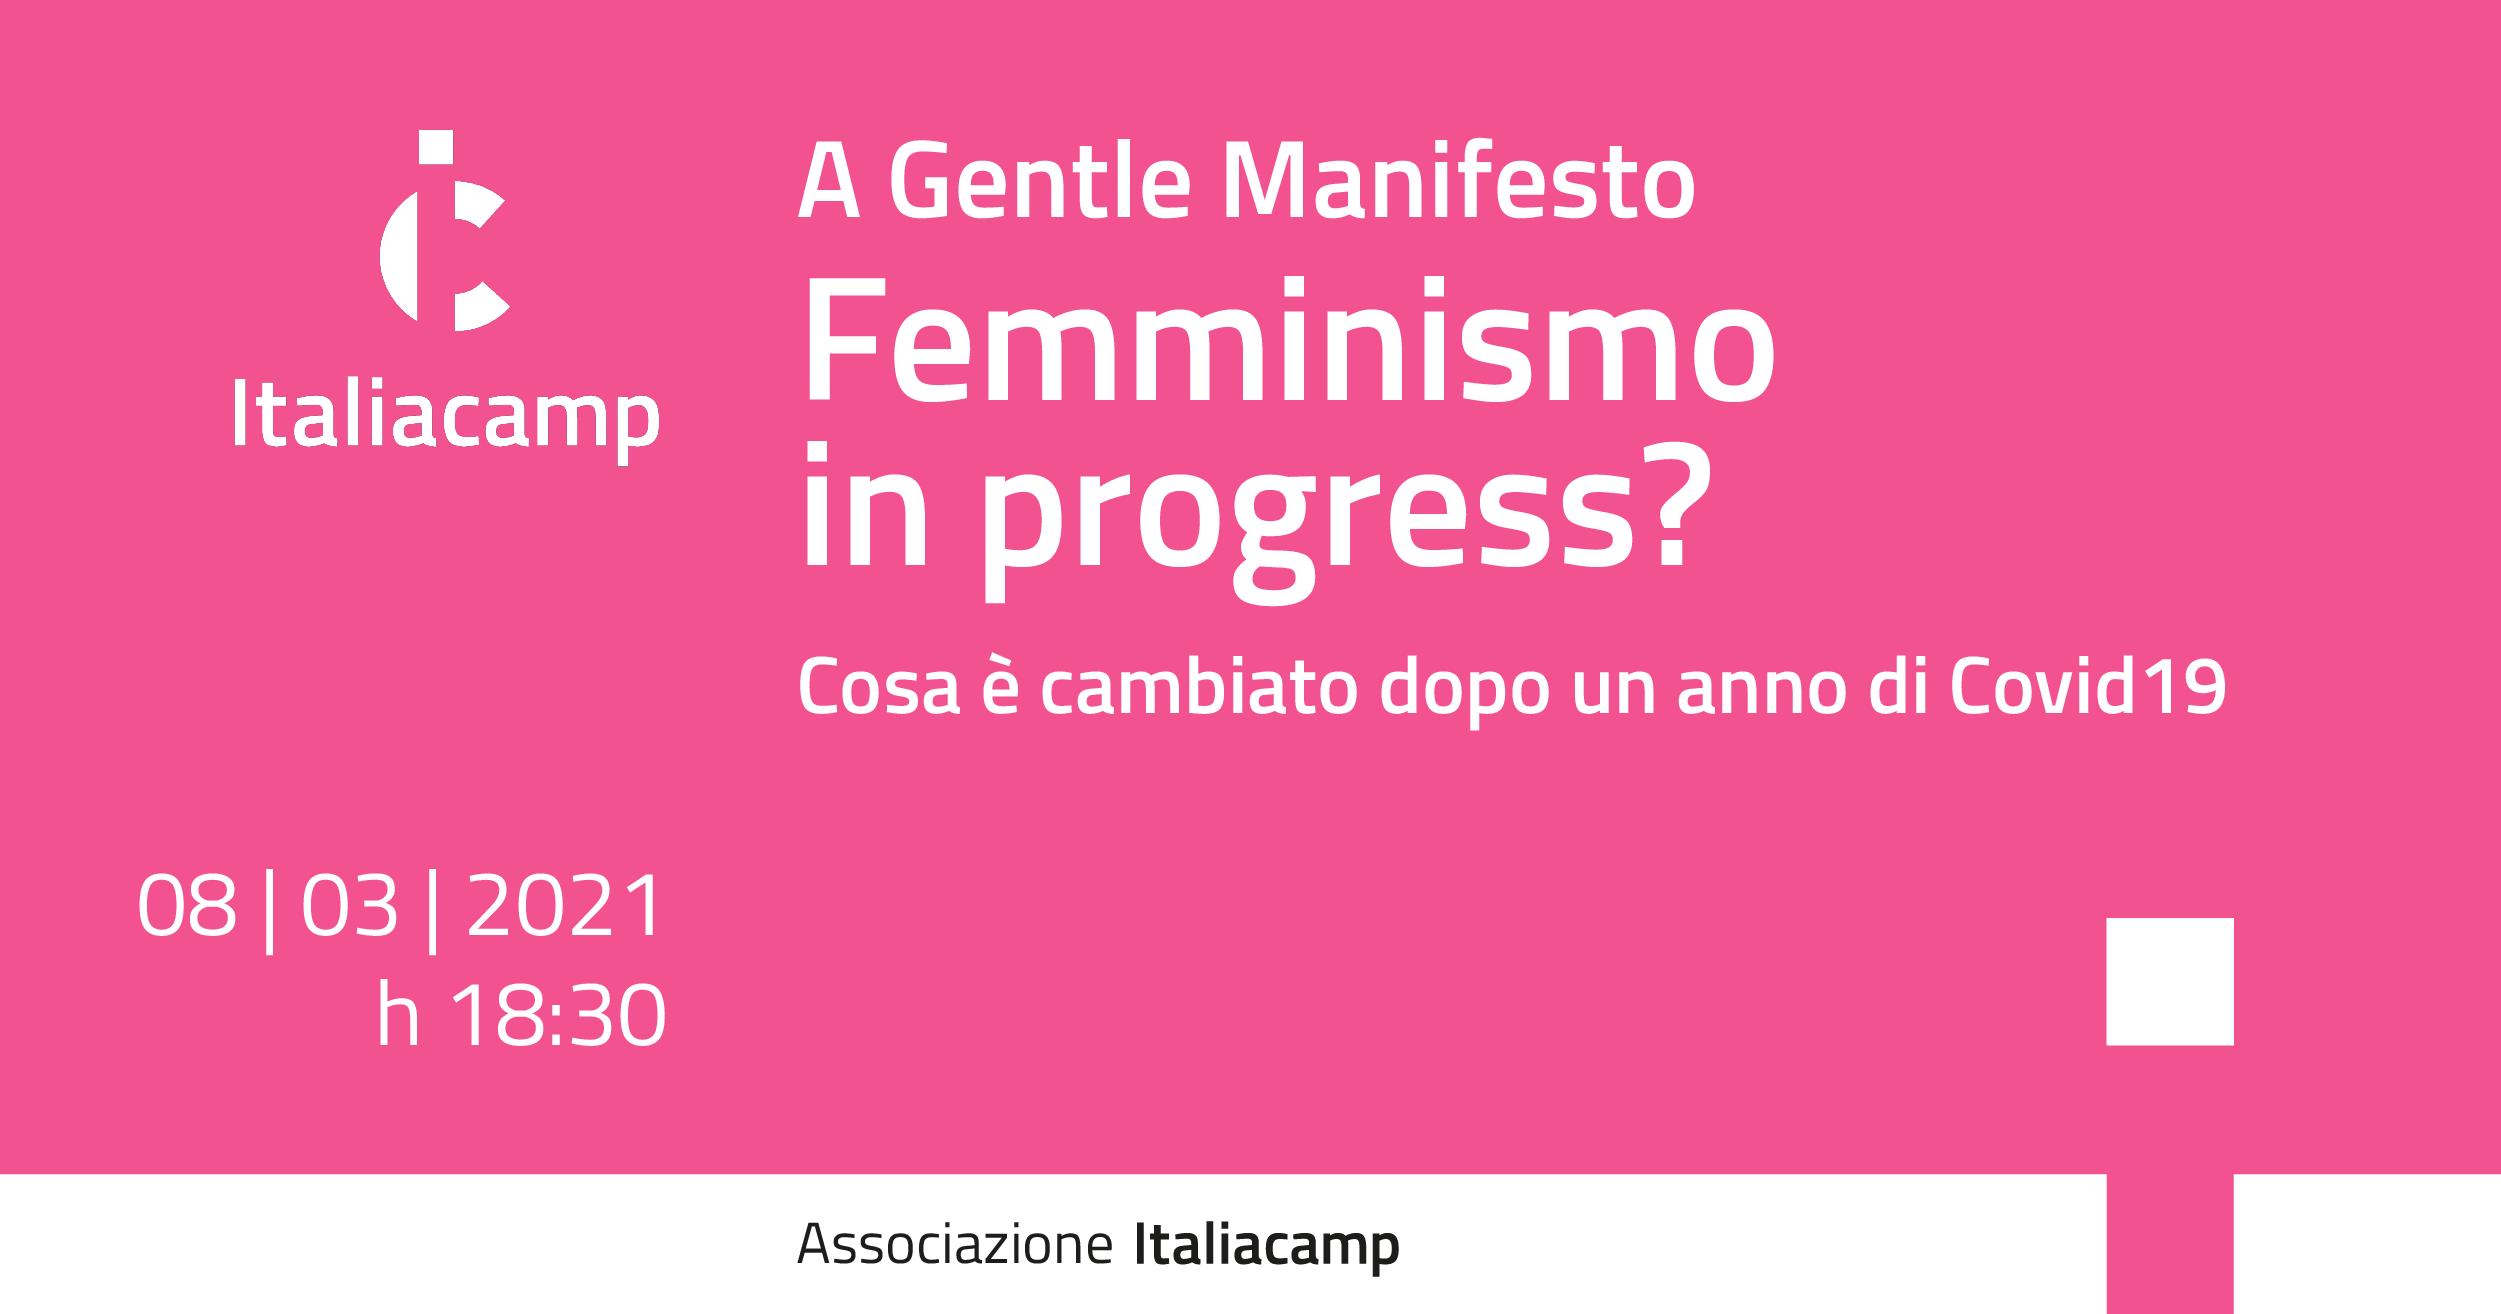 Italiacamp Femminismo in progress?